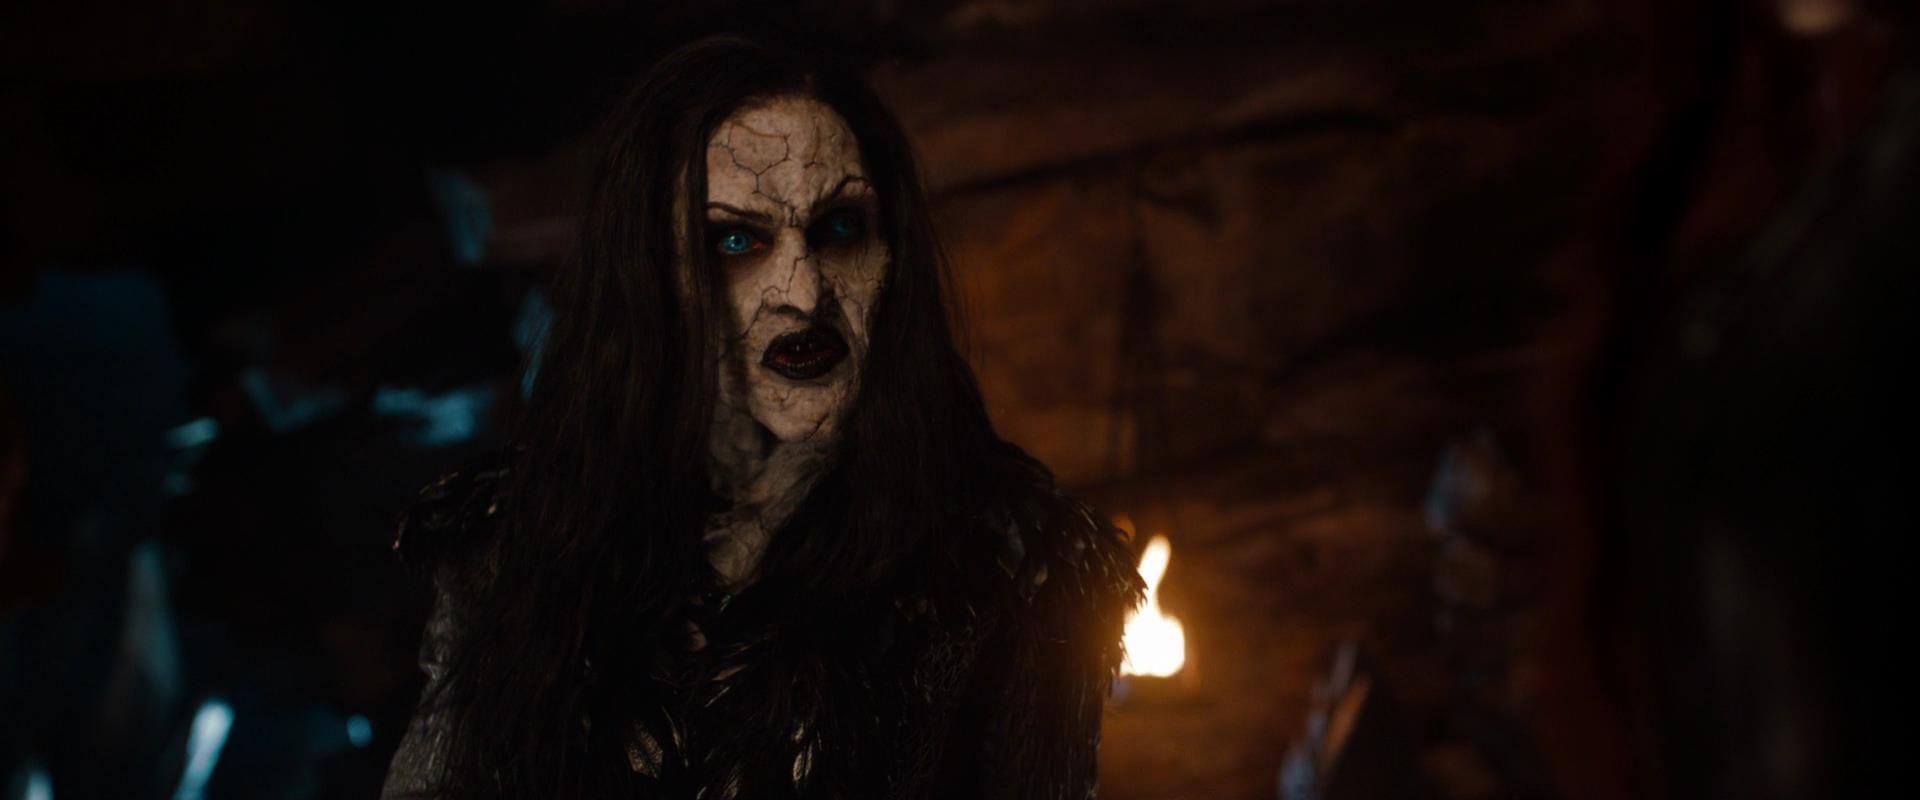 image - muriel talks | hansel & gretel: witch hunters wiki